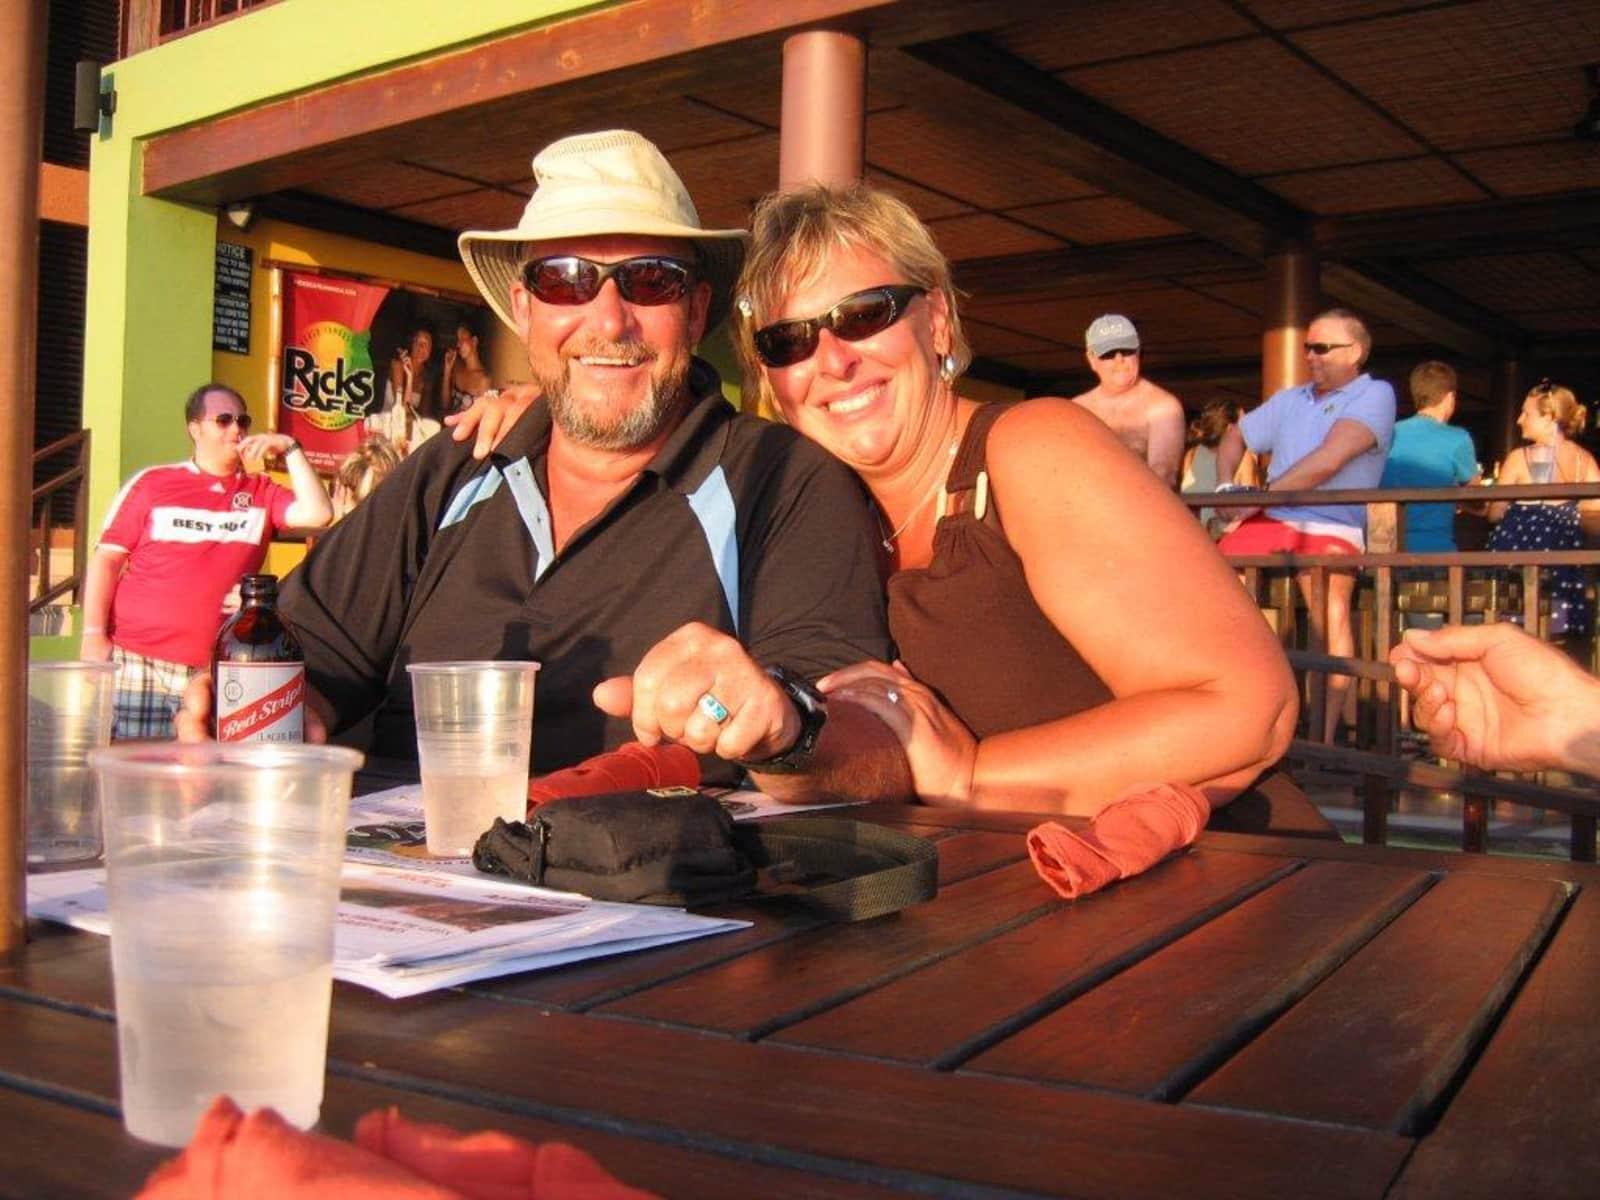 Linda & Roger from Calgary, Alberta, Canada